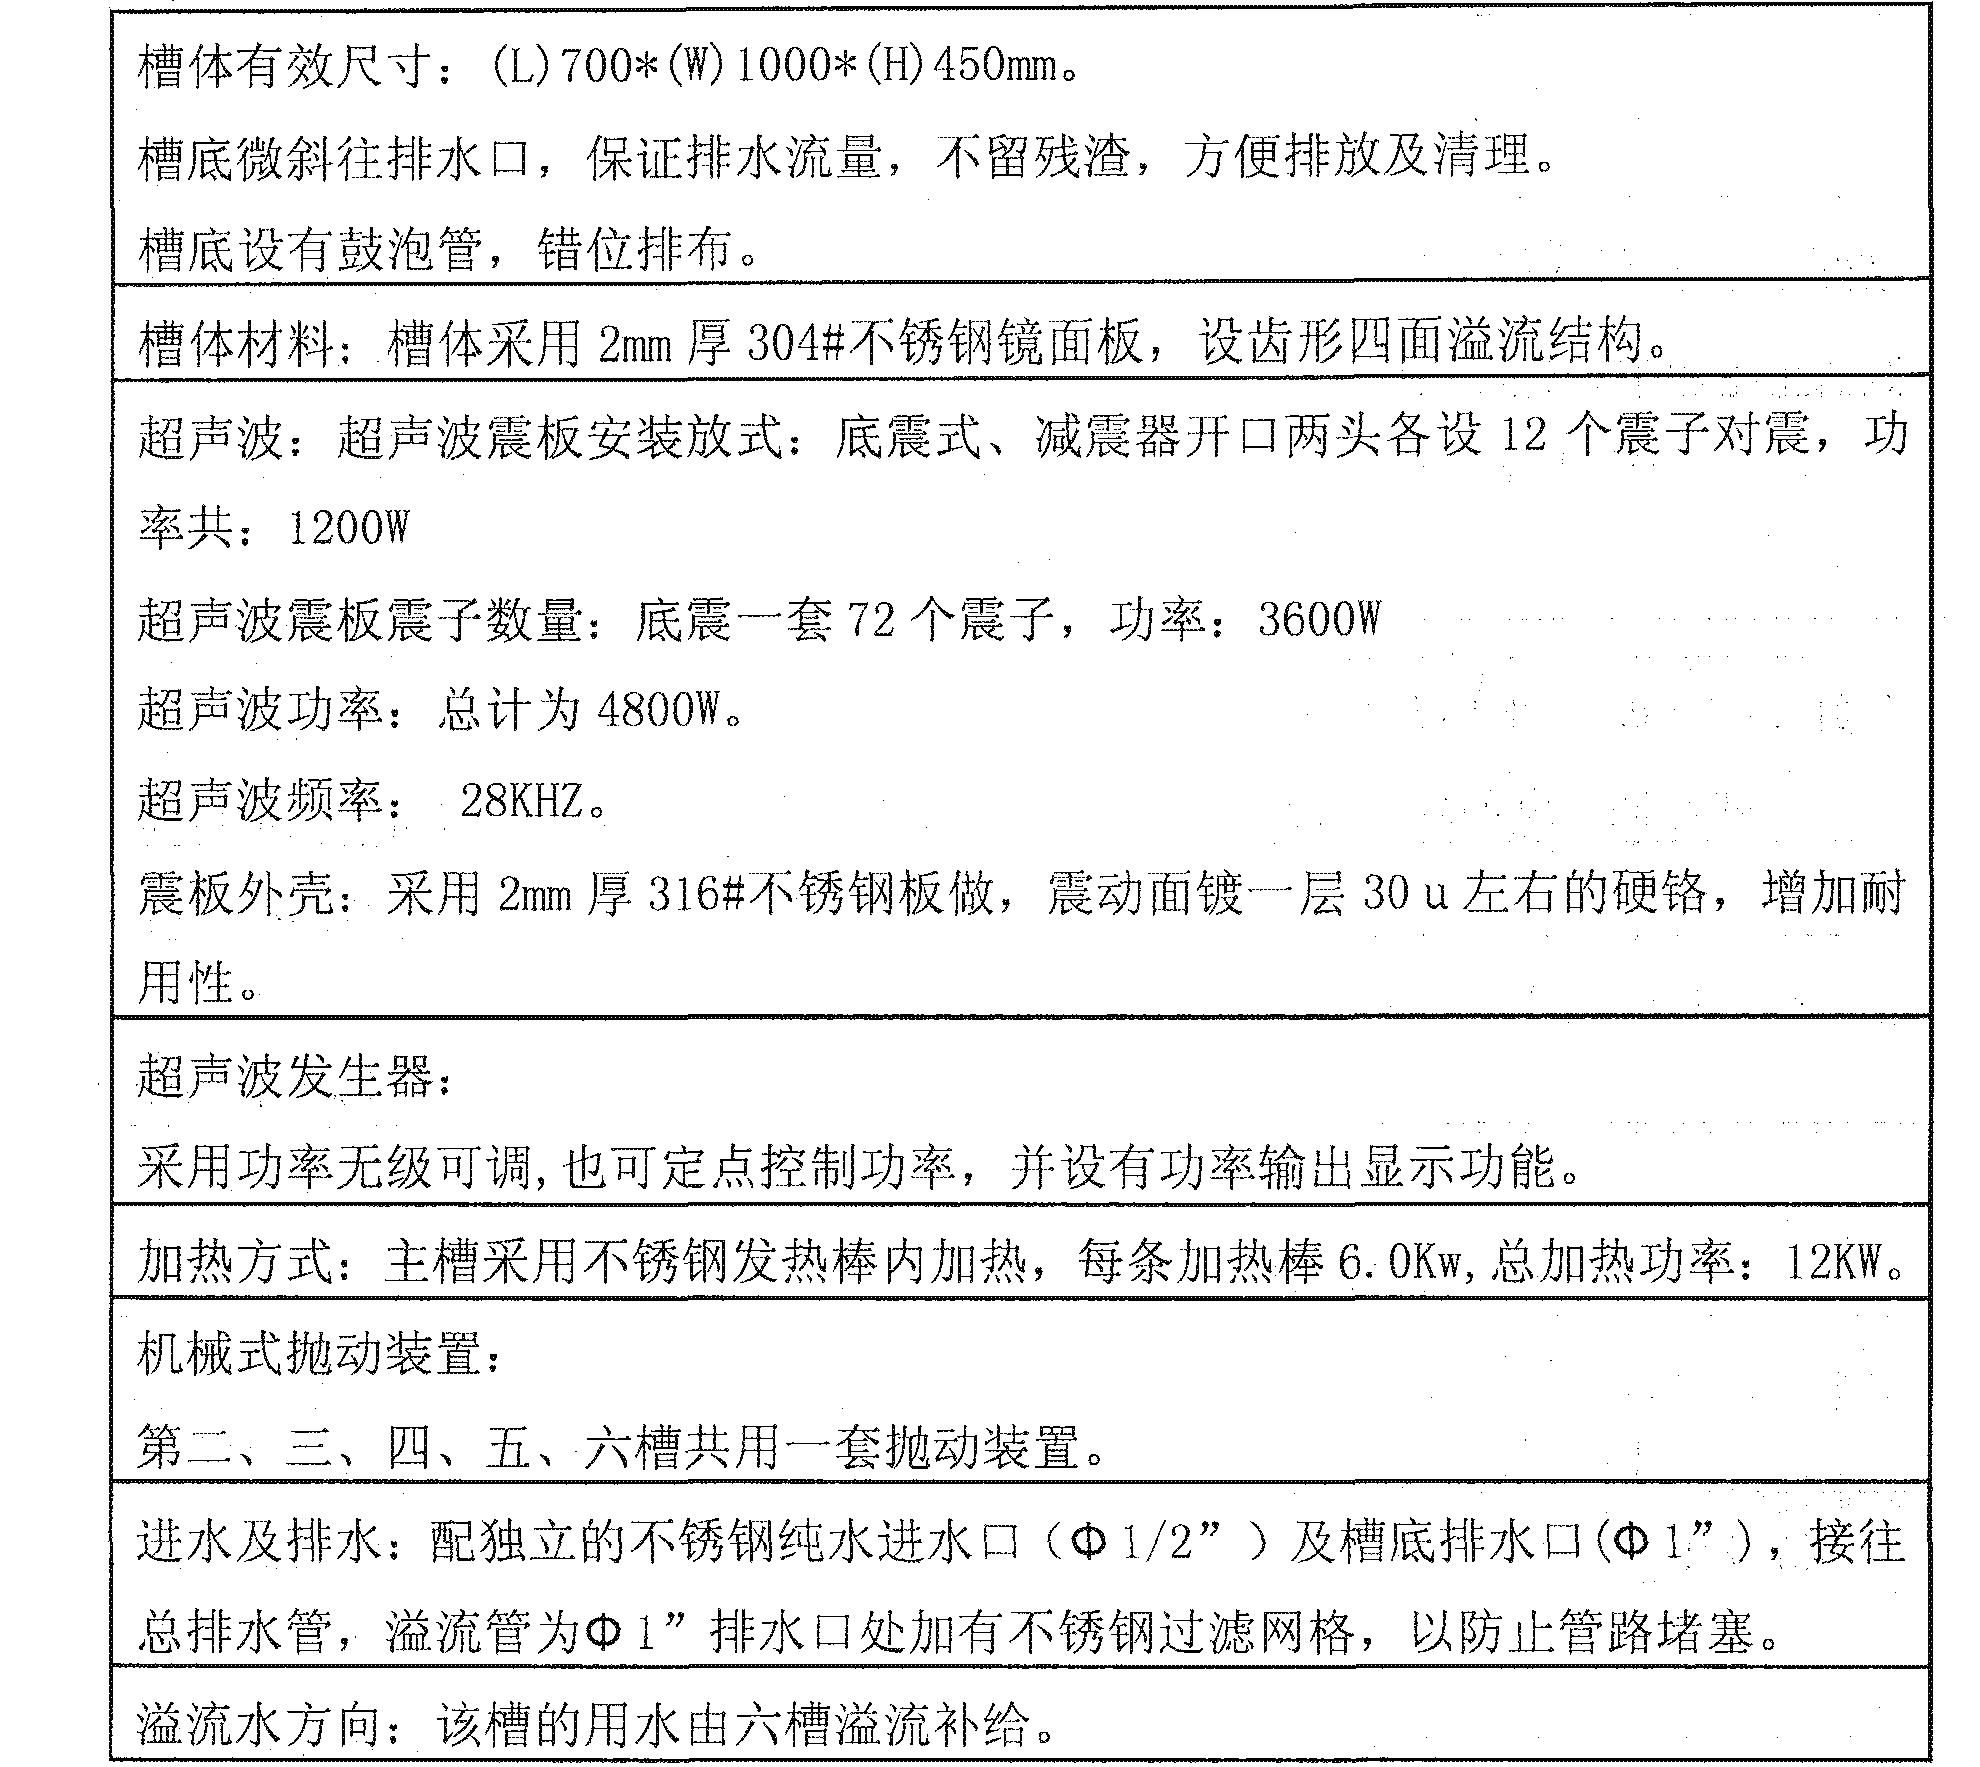 Figure CN204035120UD00101